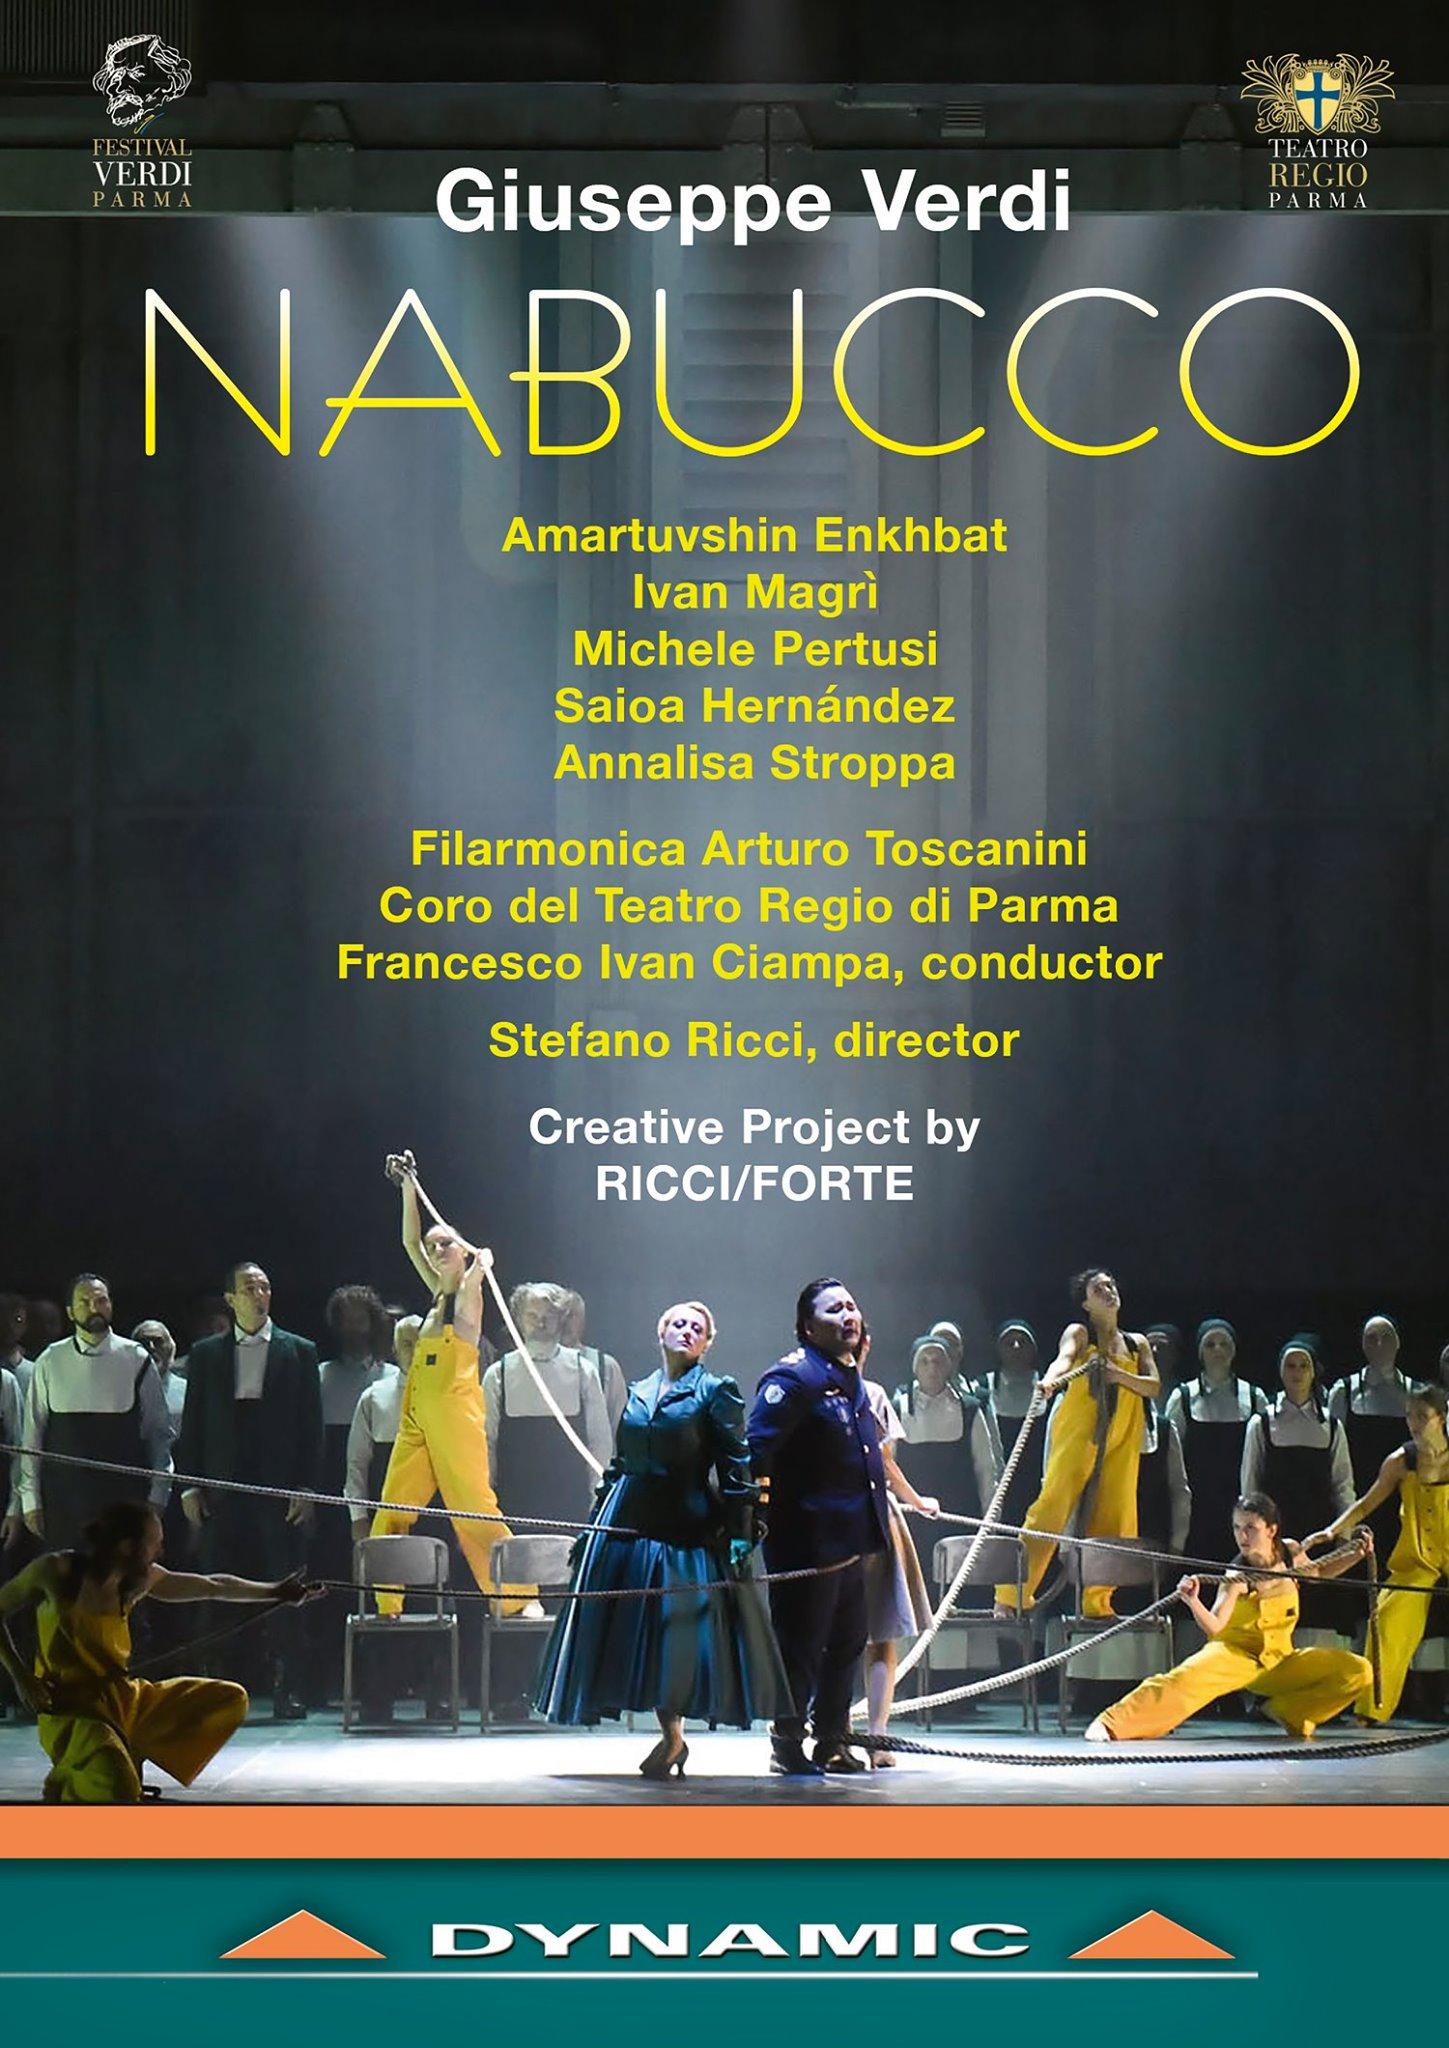 <strong>Giuseppe Verdi: Nabucco</strong>